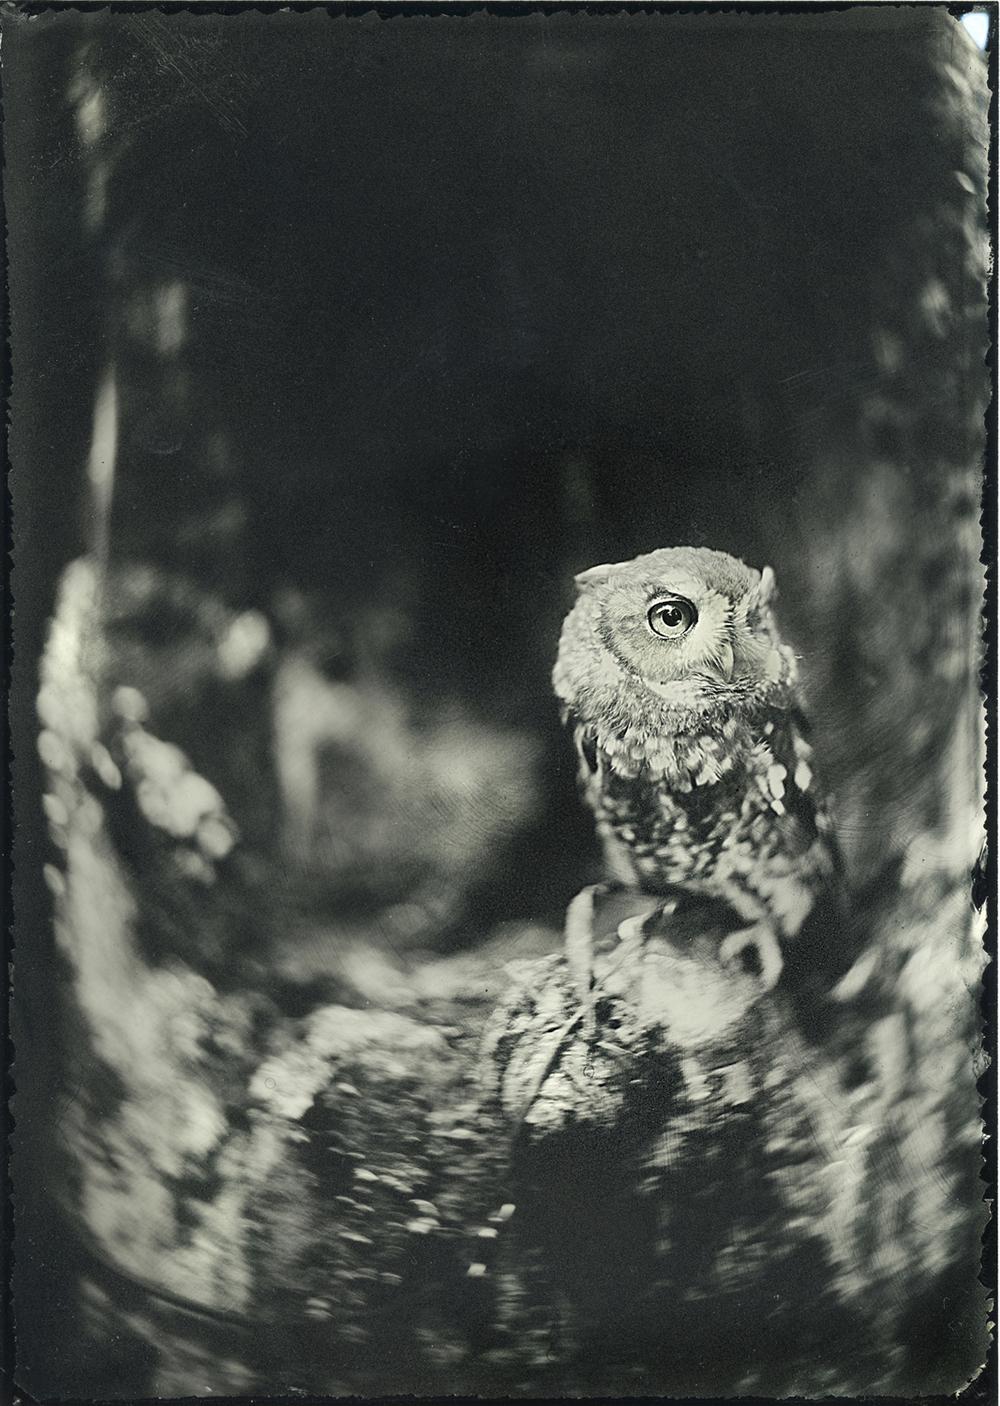 Portrait of Eastern Screech Owl, John Huneycutt